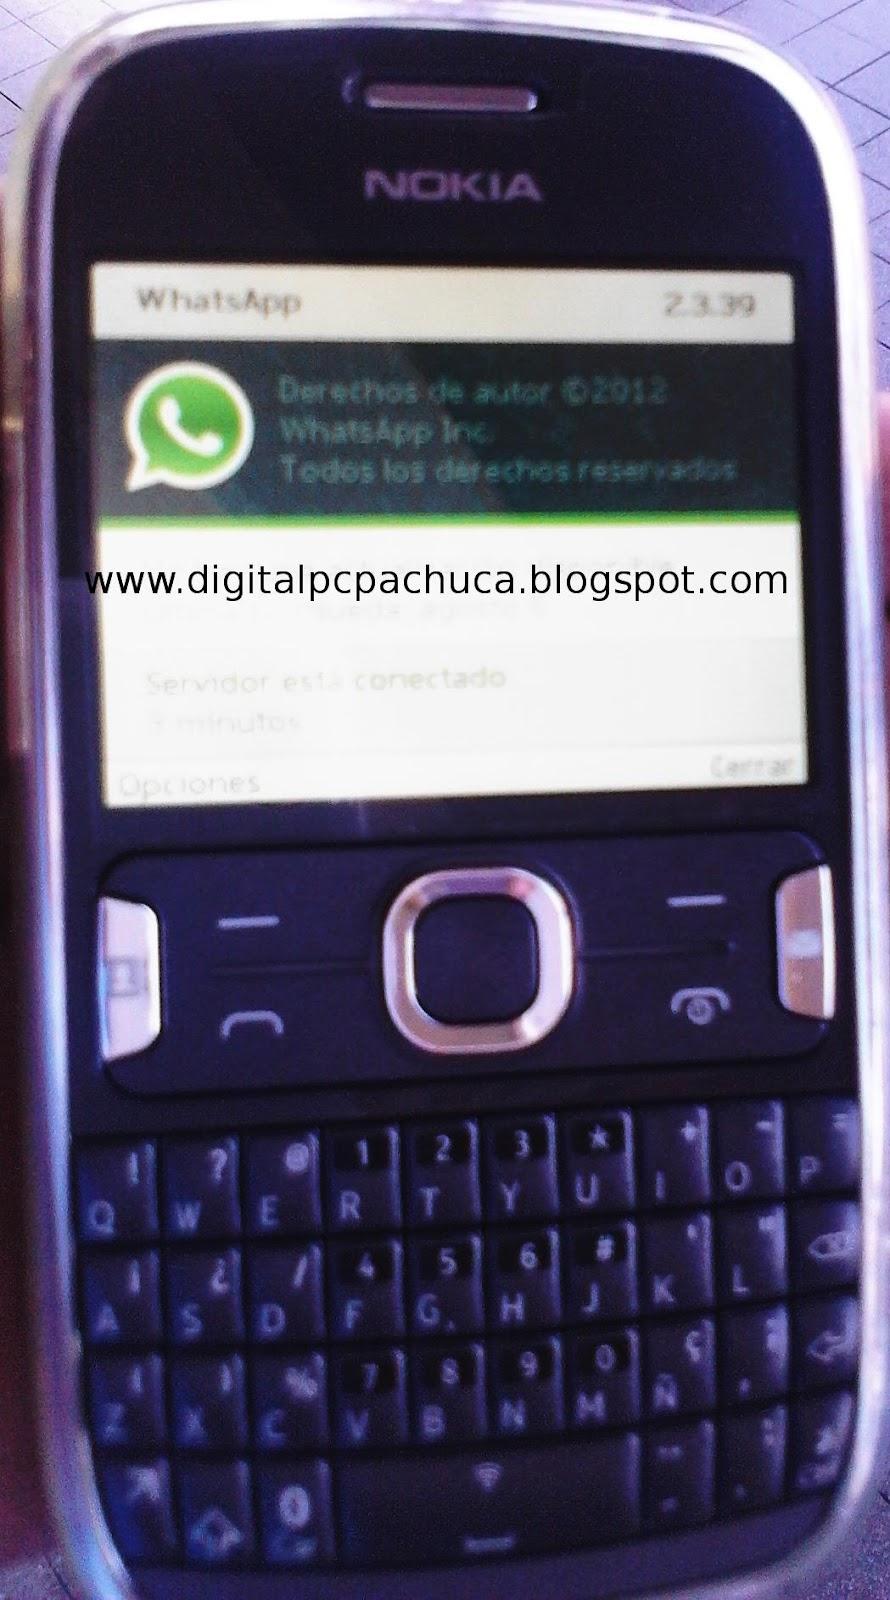 descargar whatsapp para nokia asha reparaci n de computadoras rh digitalpcpachuca com Manual Del iPhone 5 Panasonic TC 55Le54 Manual